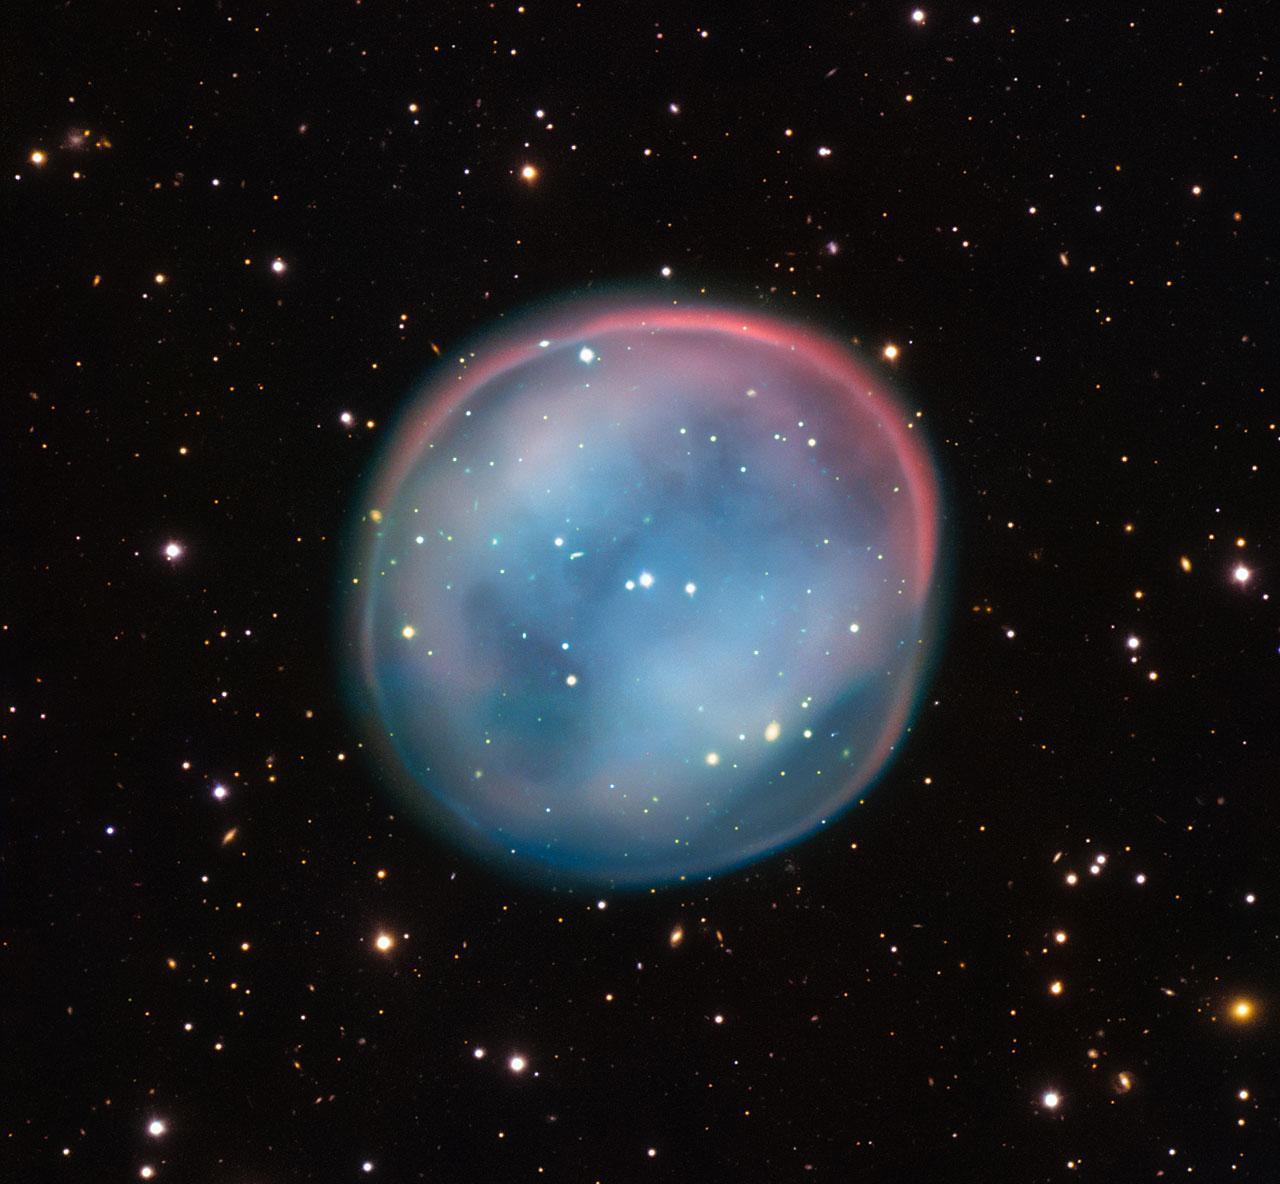 ESO planetary nebula